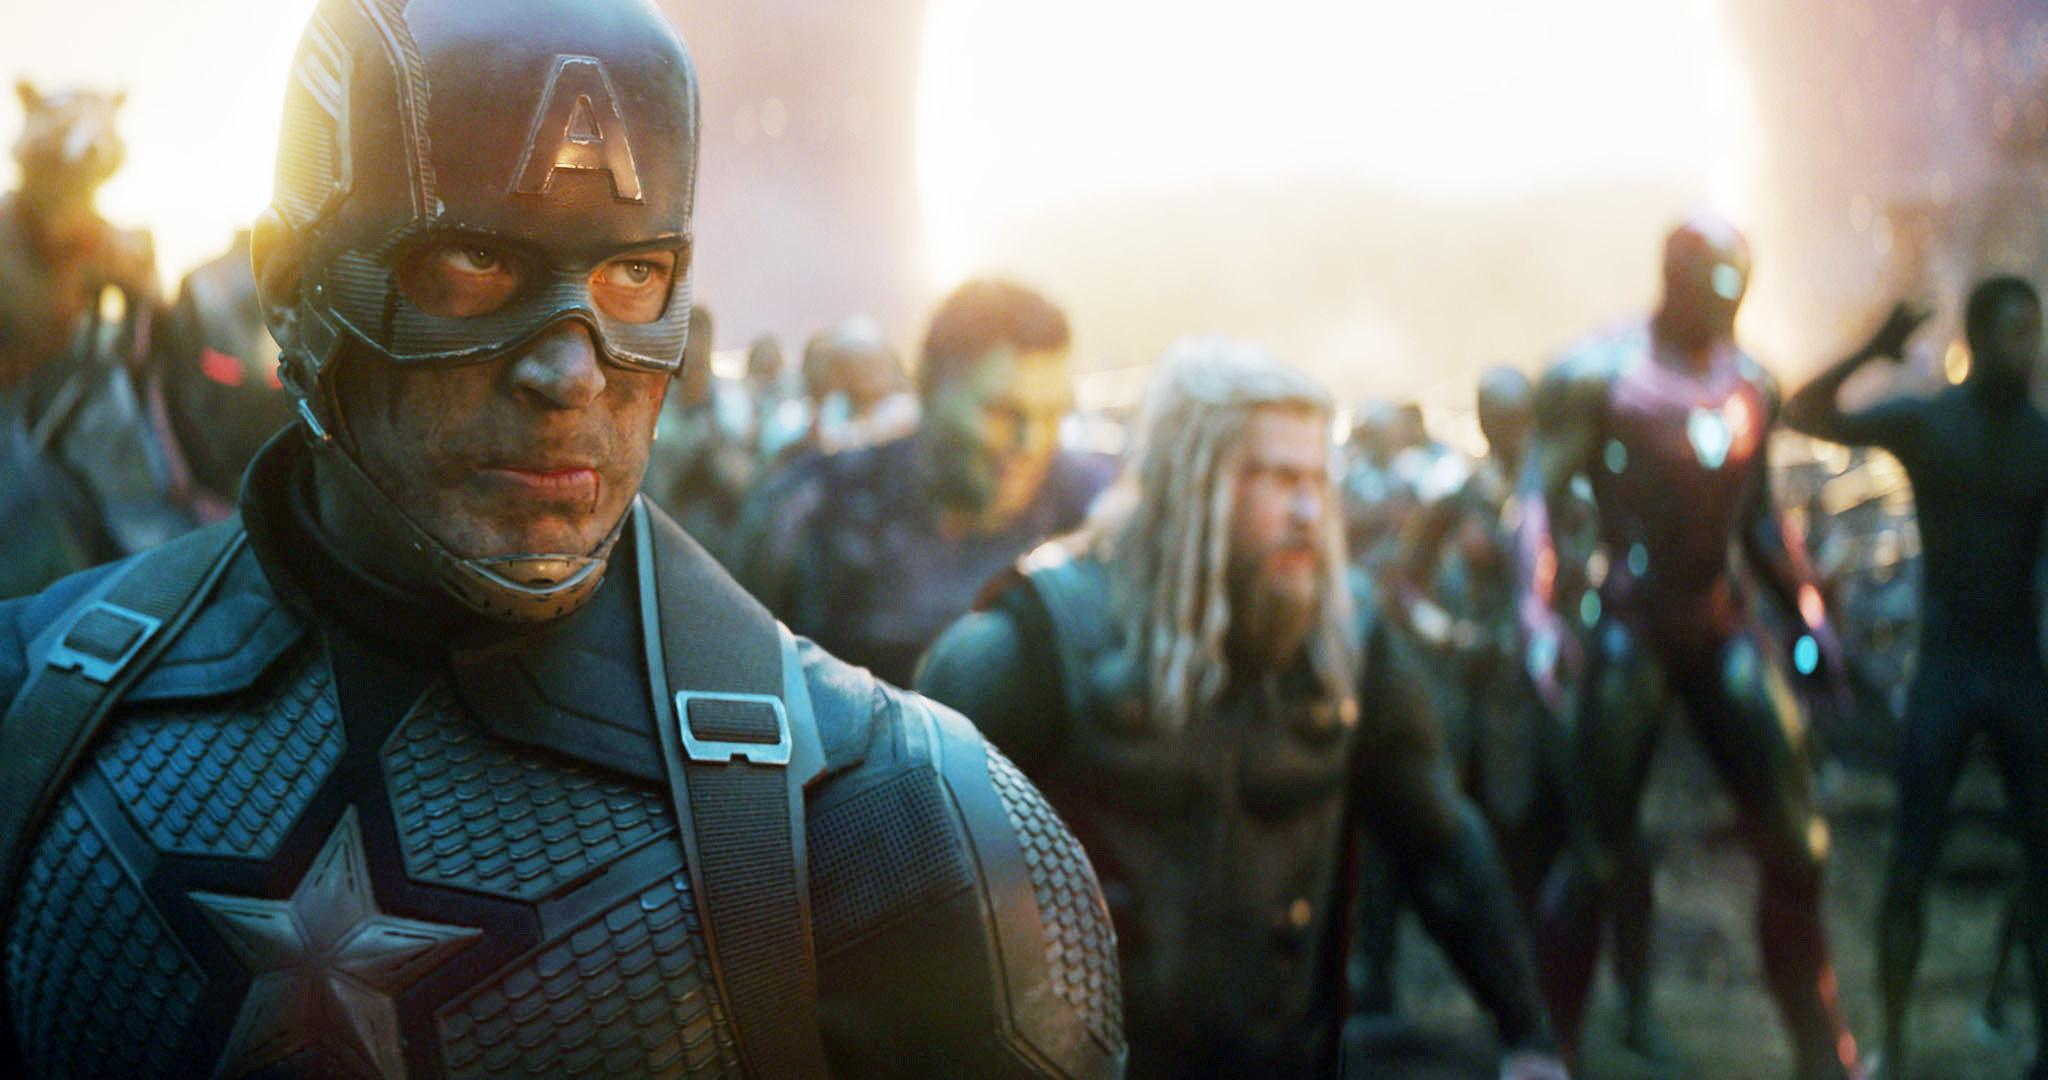 Superheroes gathered together